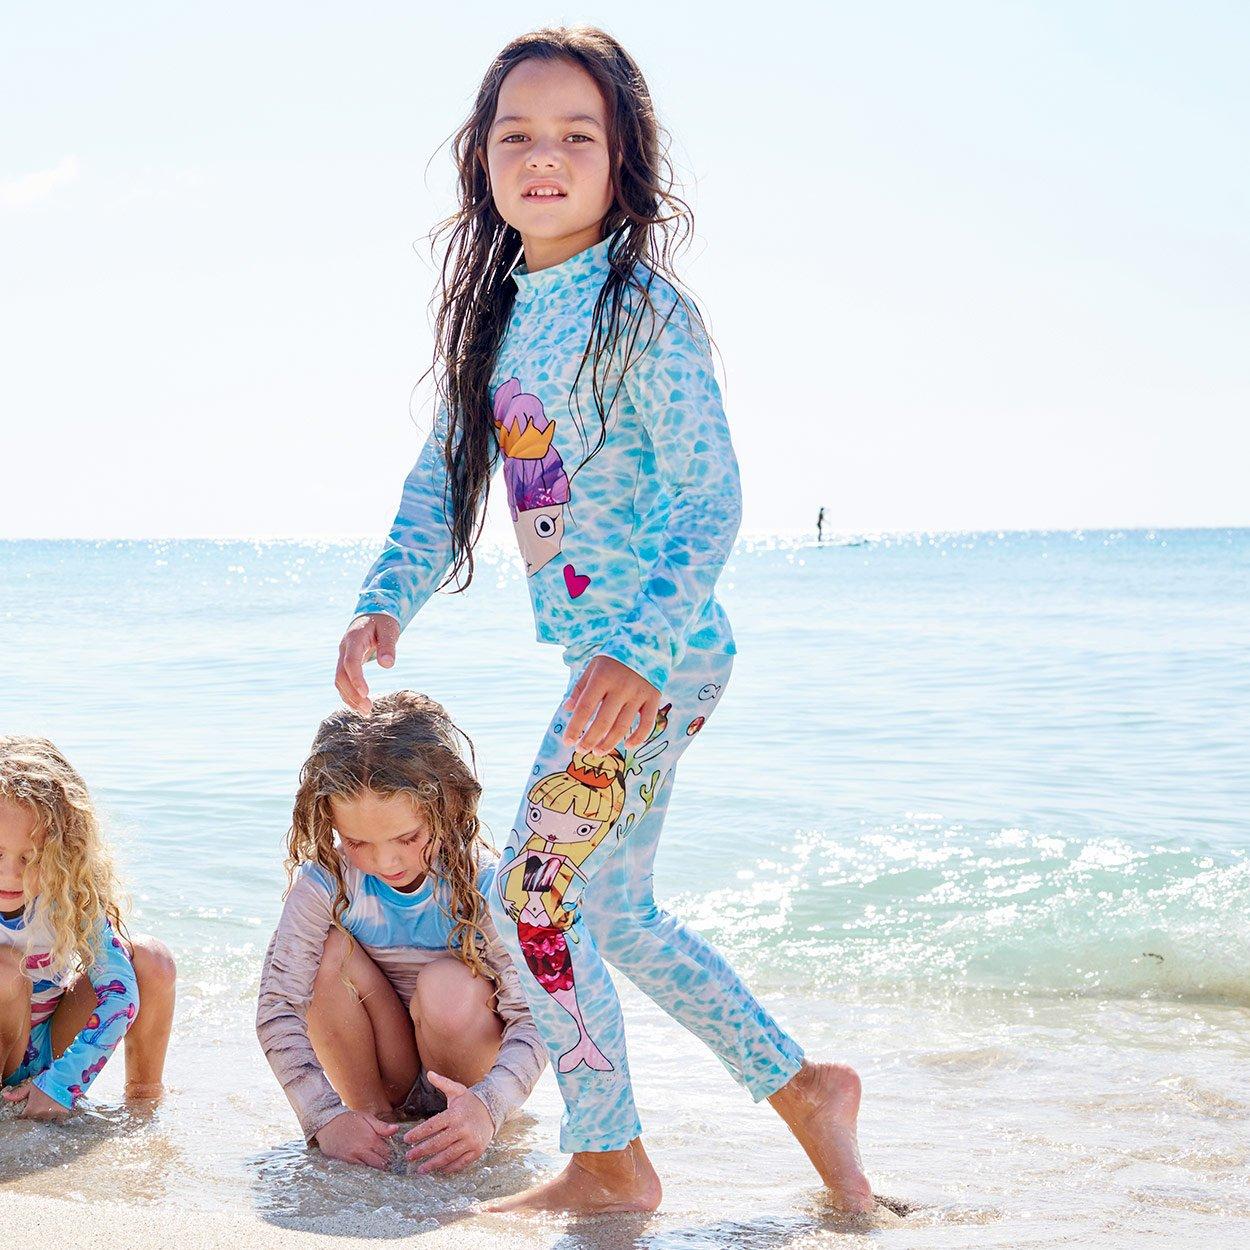 Mermaids 2Pc Rash Guard Set Left View Girls Playing With Sand Beach Sunpoplife